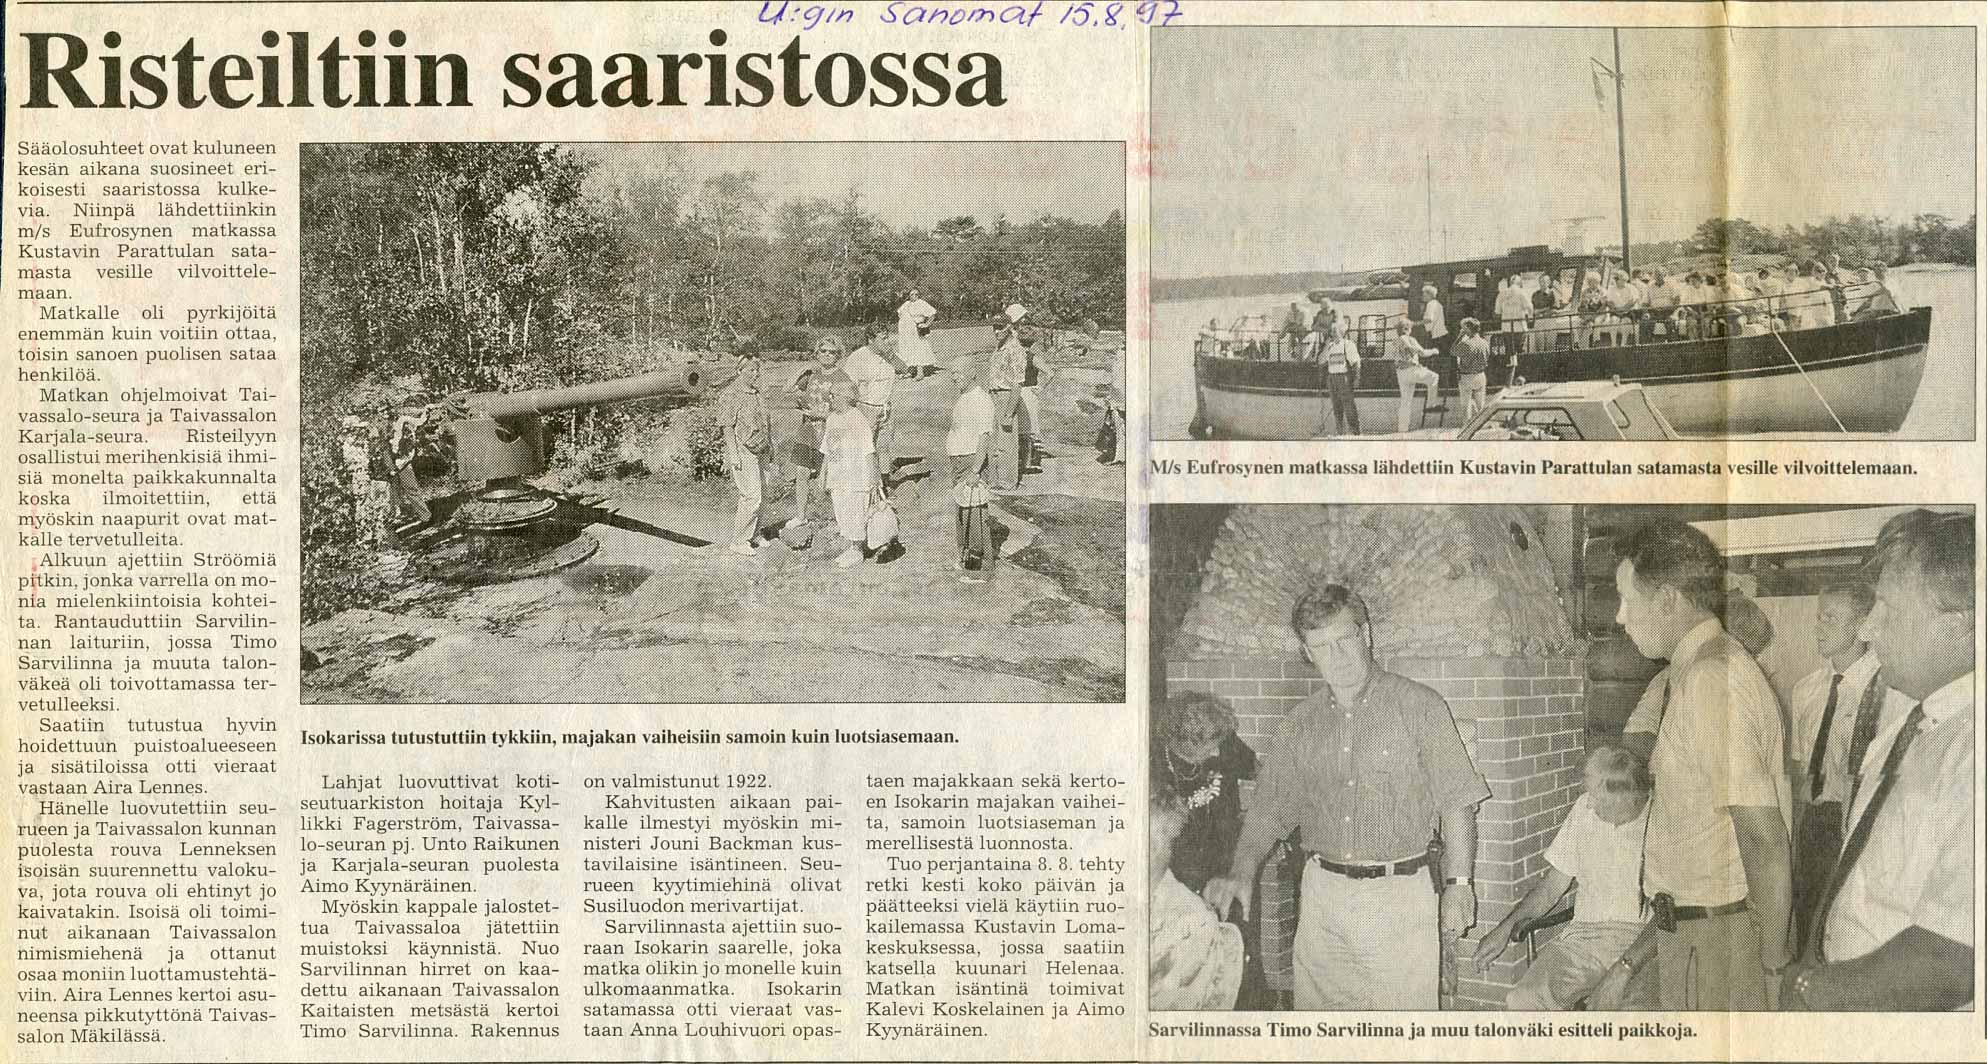 Uudenkaupungin Sanomat 15.8.1997